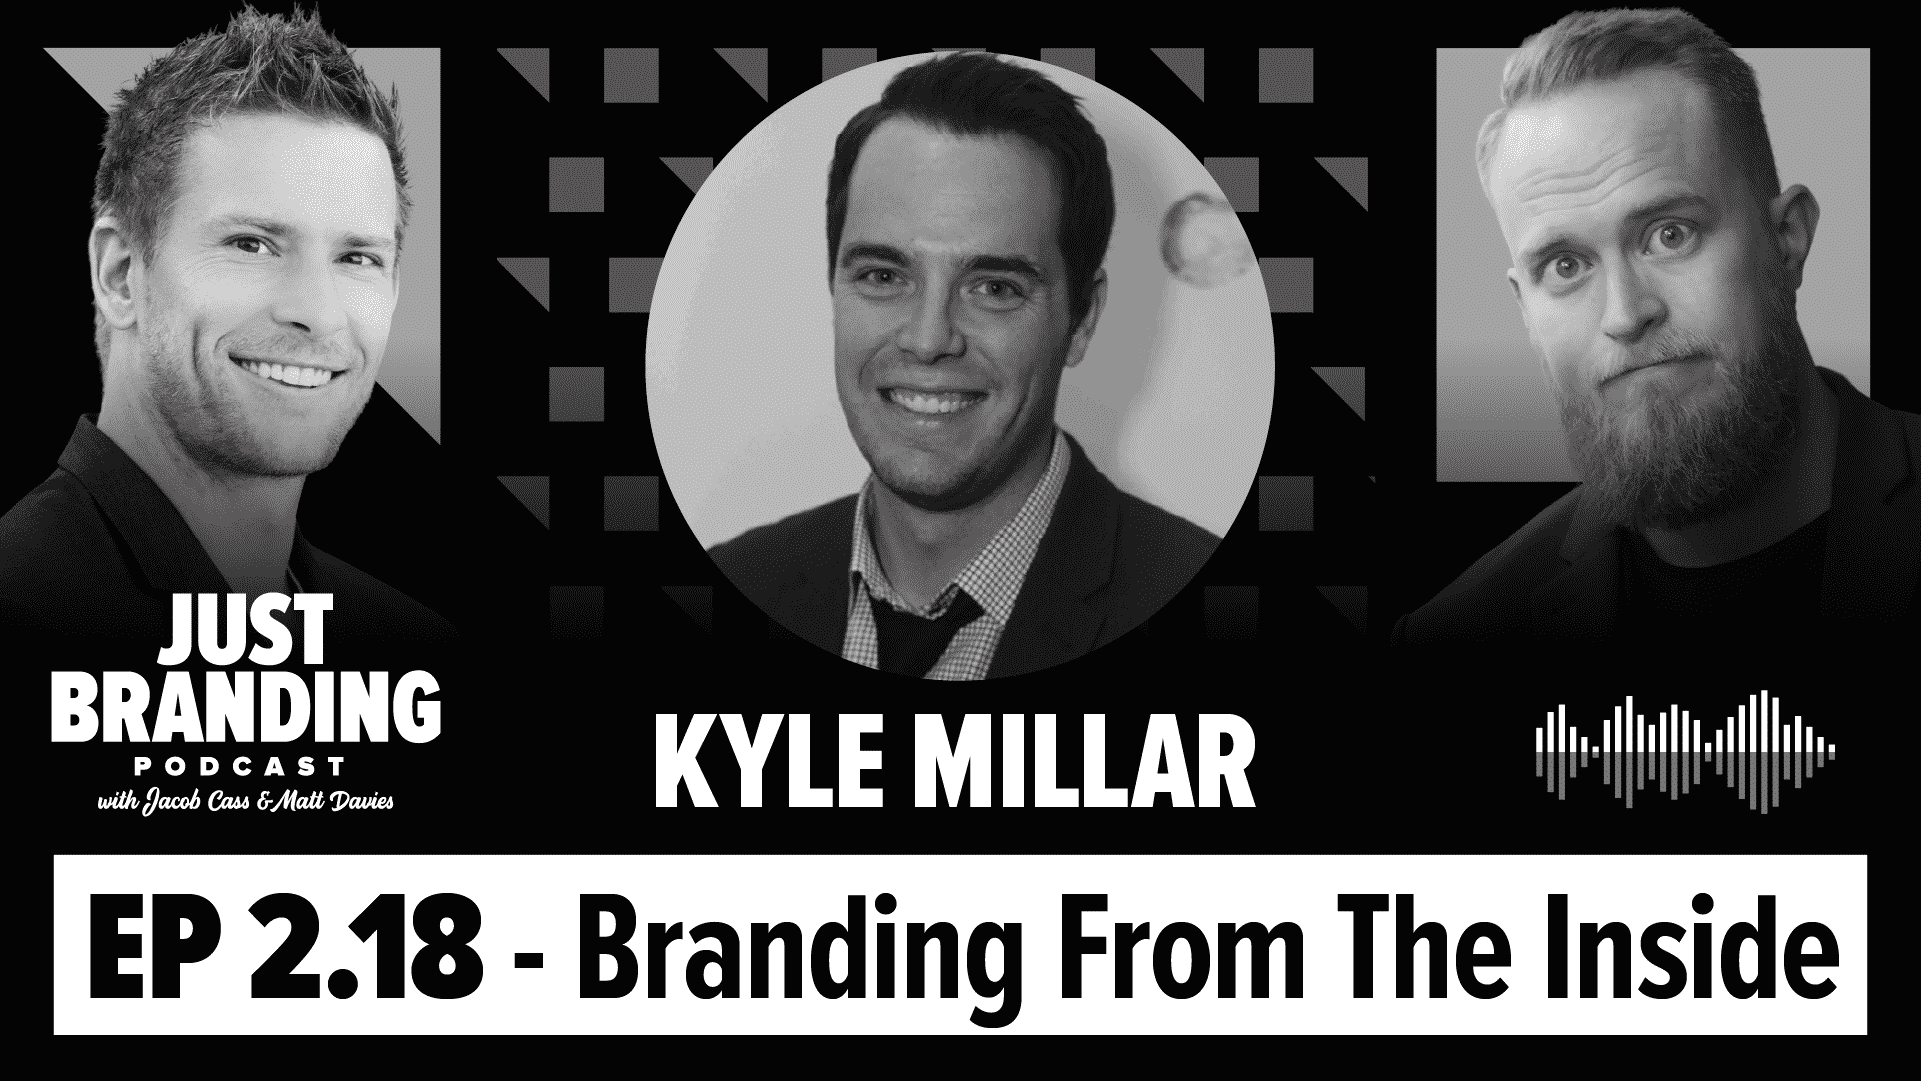 Kyle Millar JUST Branding Podcast